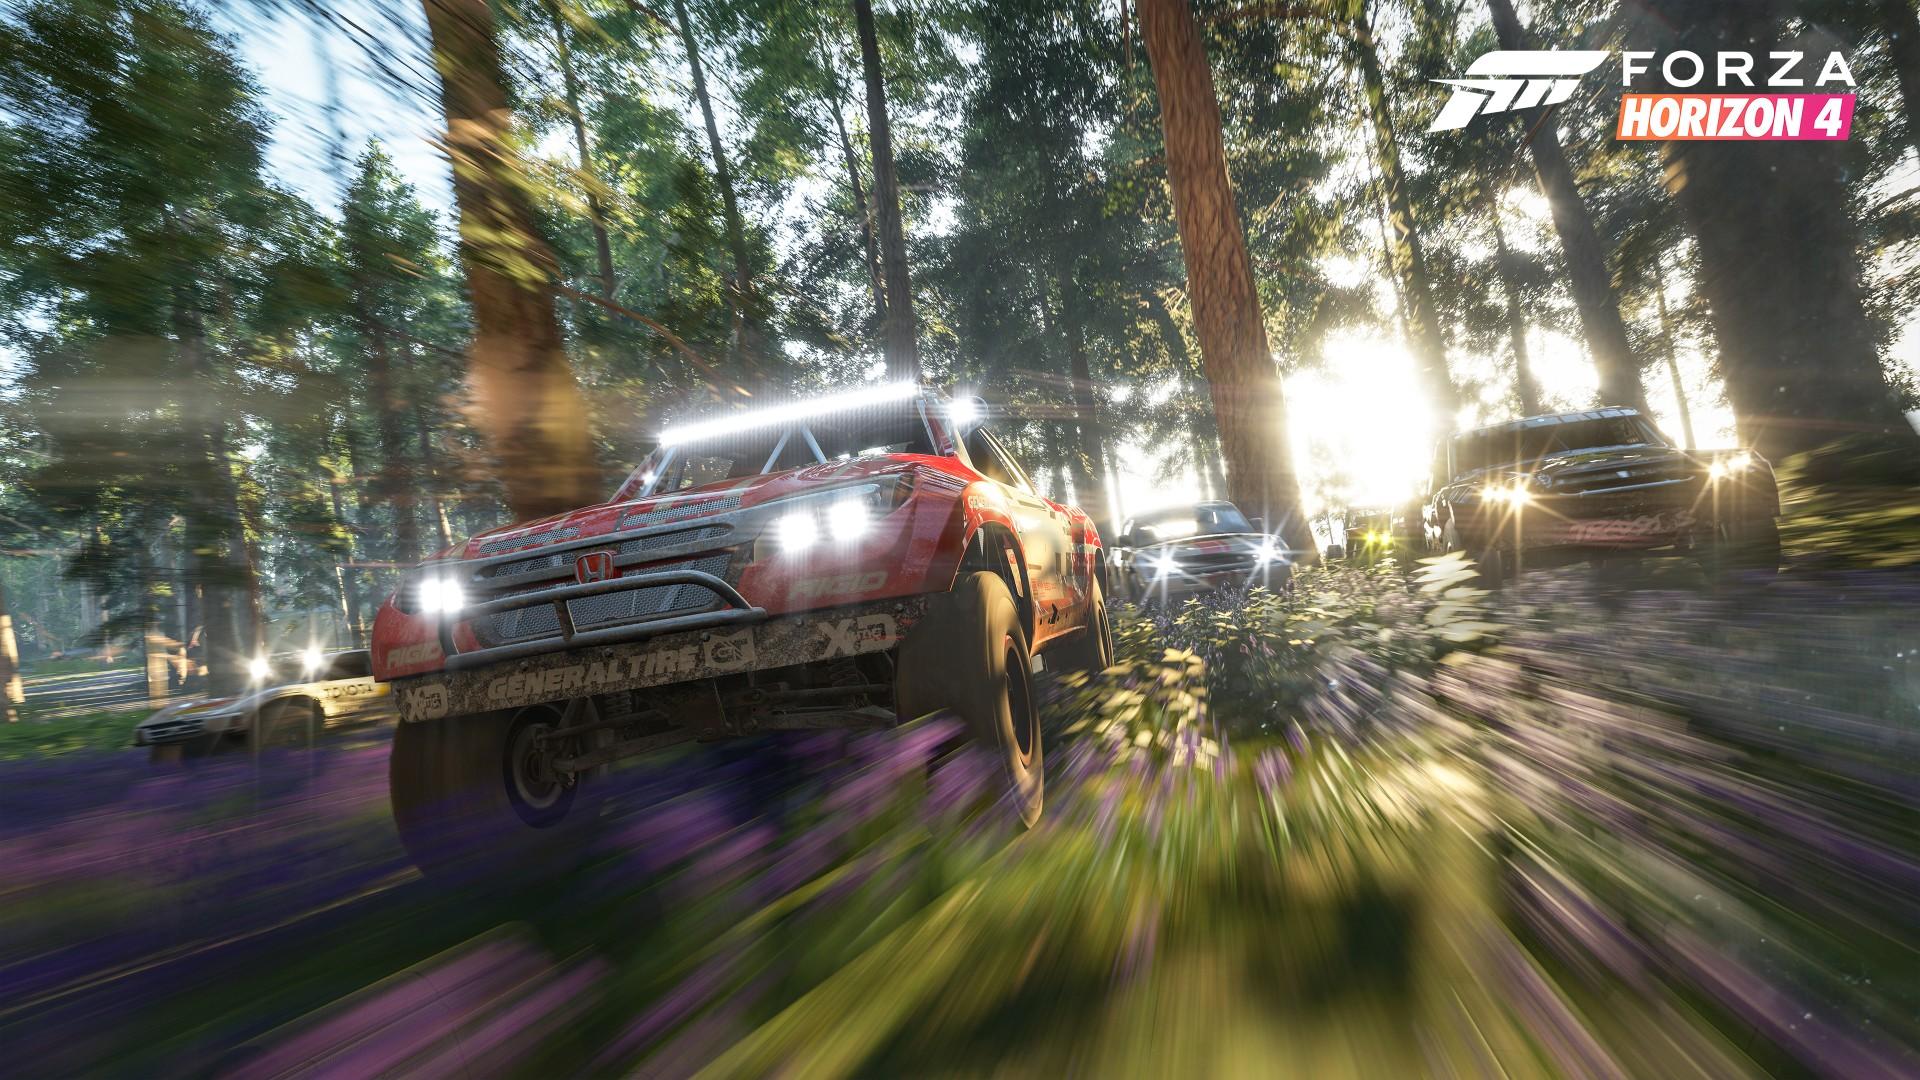 Forza Horizon 4 demo Forza-Horizon-4_Forest-Trucks-1.jpg